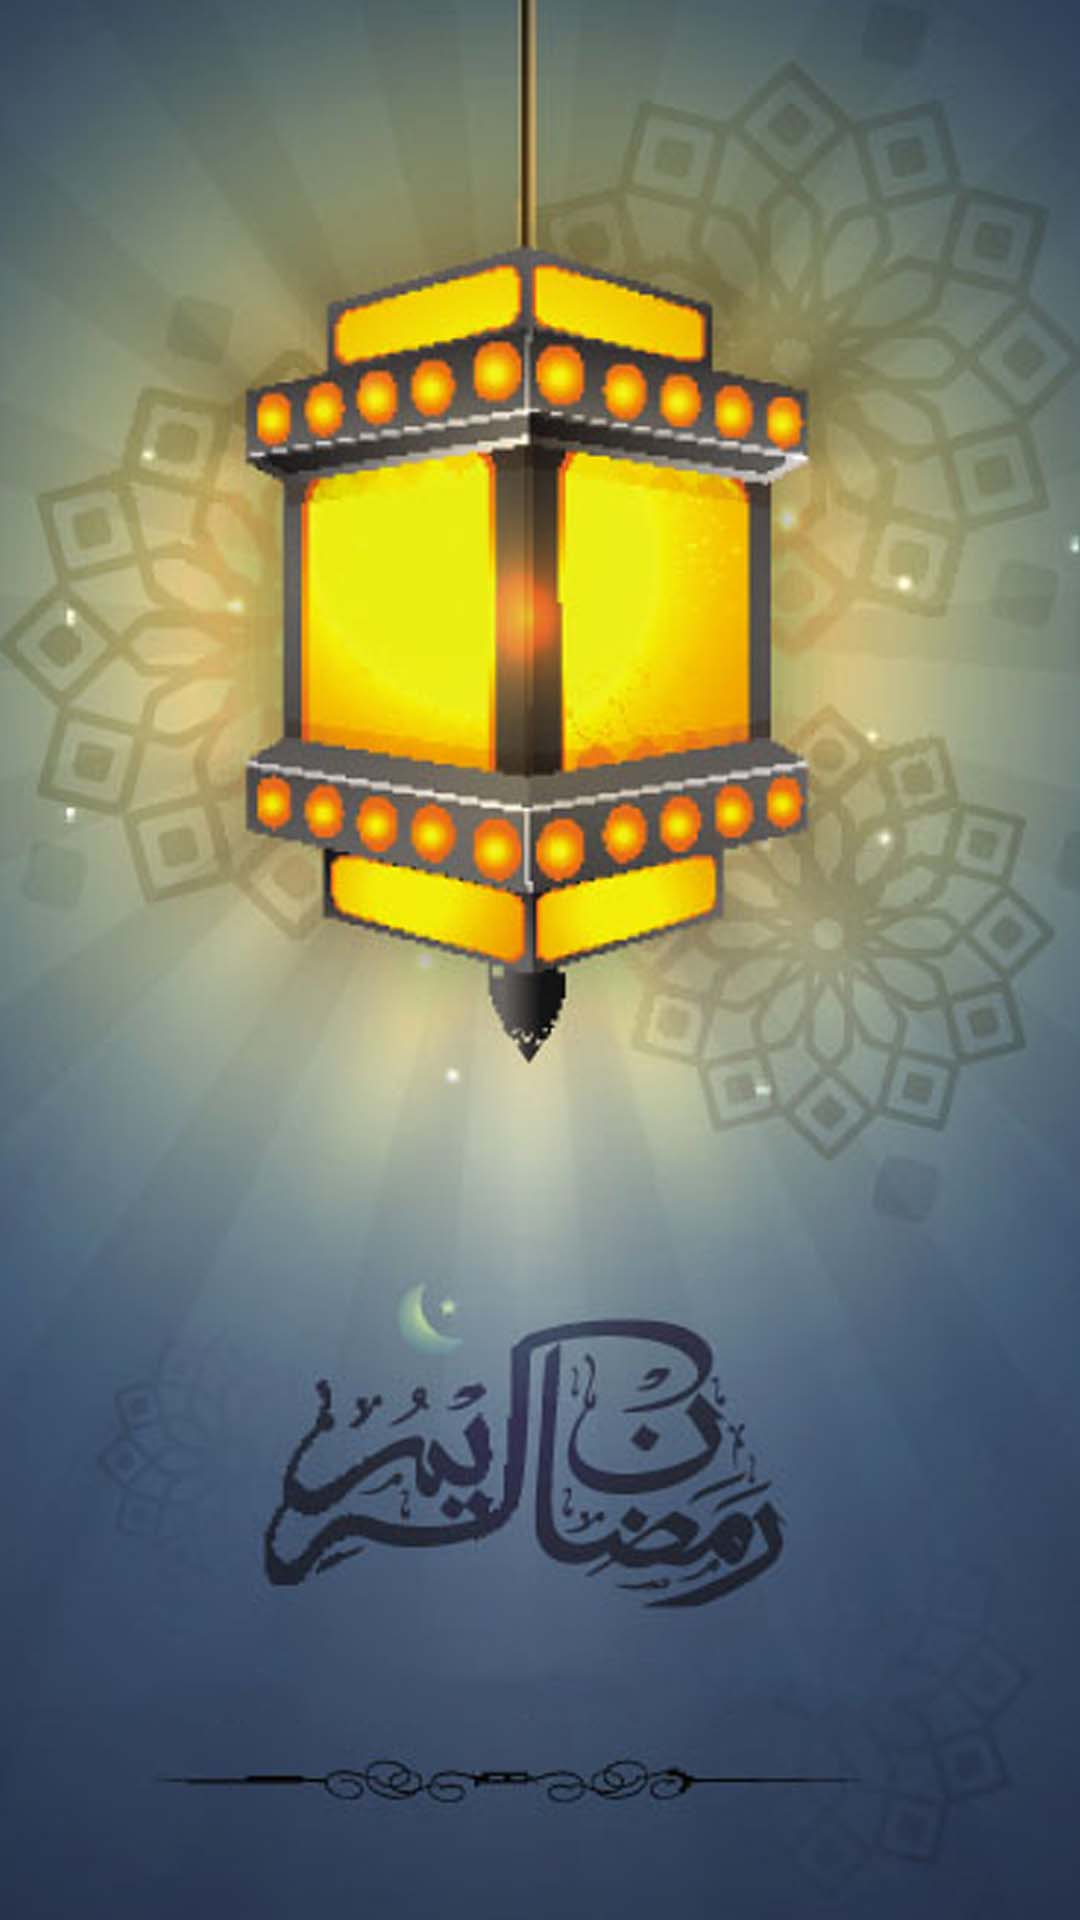 خلفيات موبايل رمضان كريم Mobile Wallpapers HD 8 خلفيات موبايل رمضان كريم Mobile Wallpapers HD